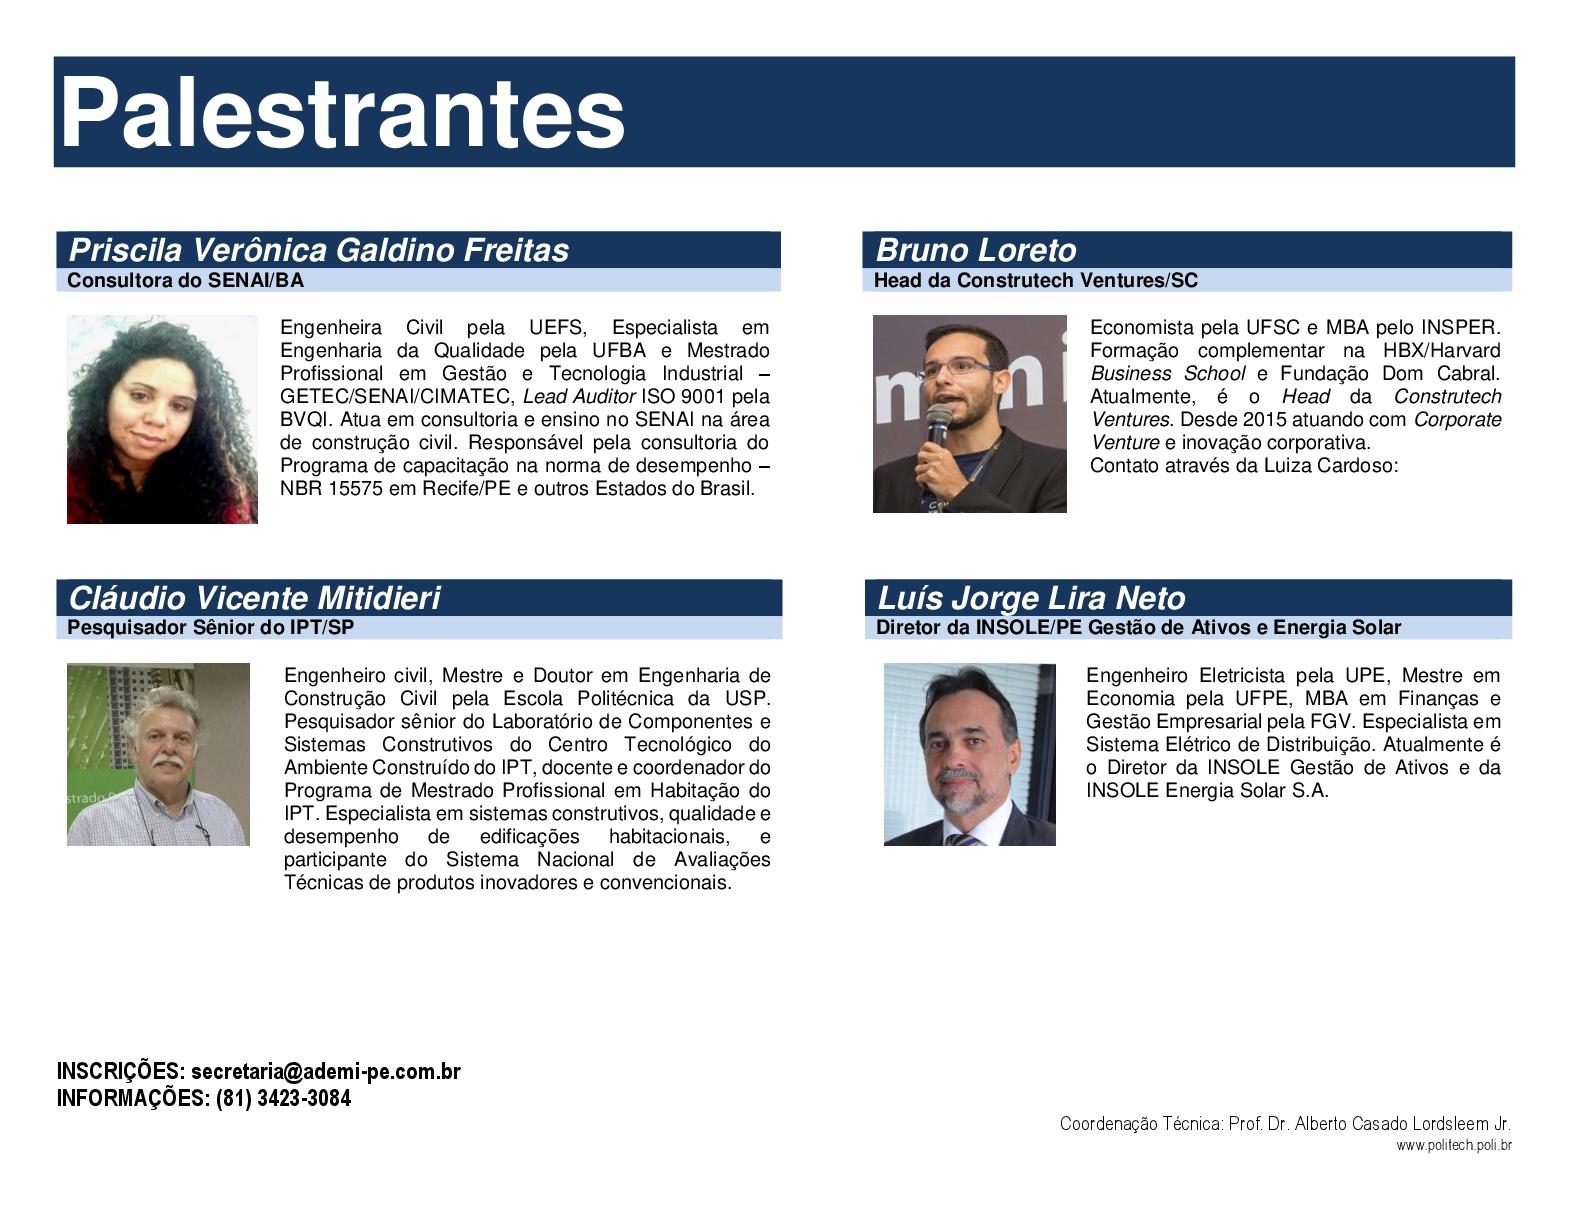 FOLDER-Seminario-CTC.ADEMI---Desempenho---06.06.2018---v.02-002